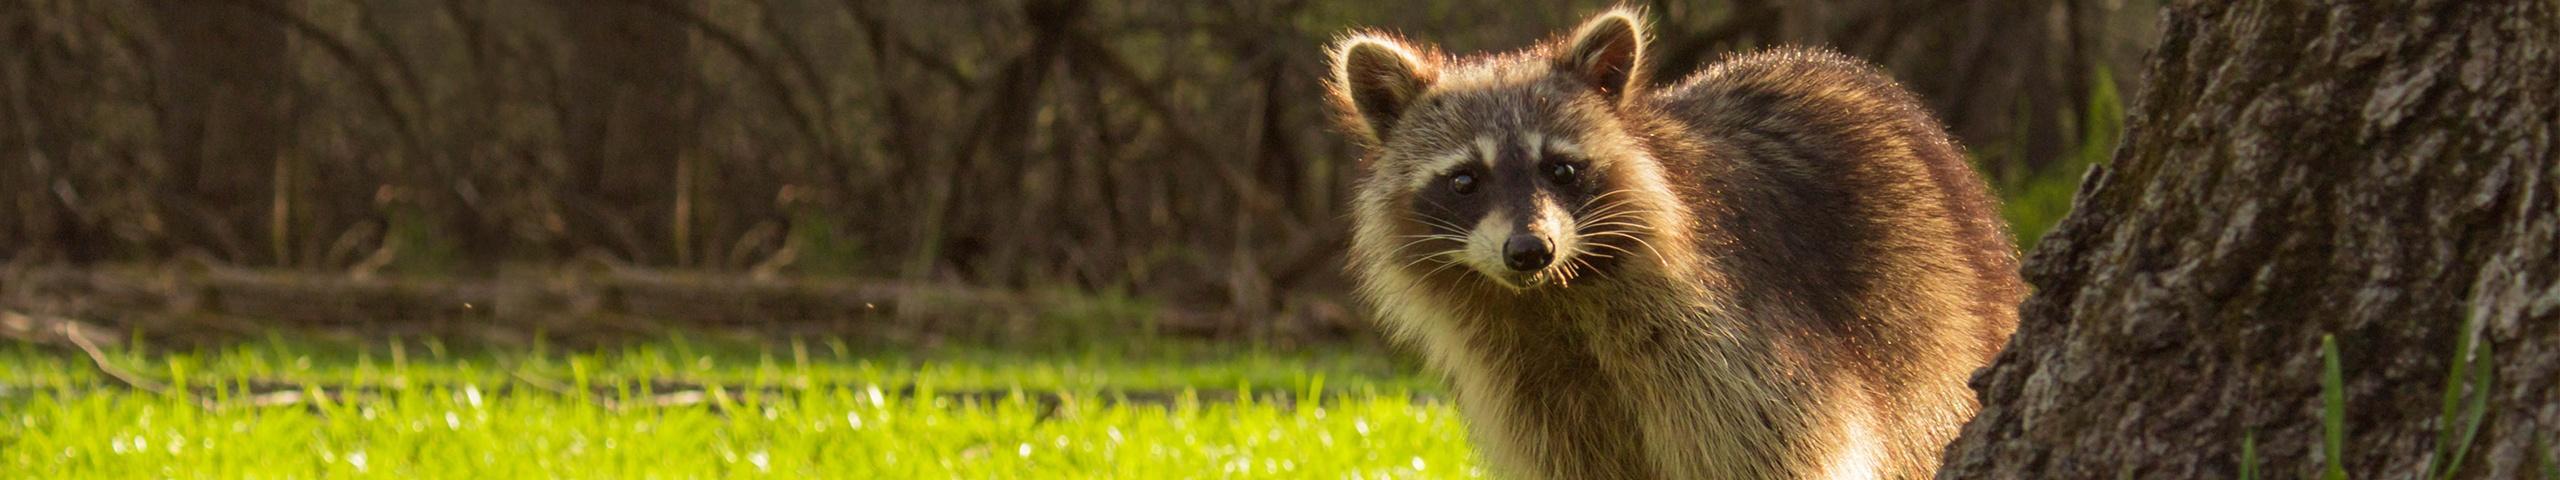 a raccoon outside of a house